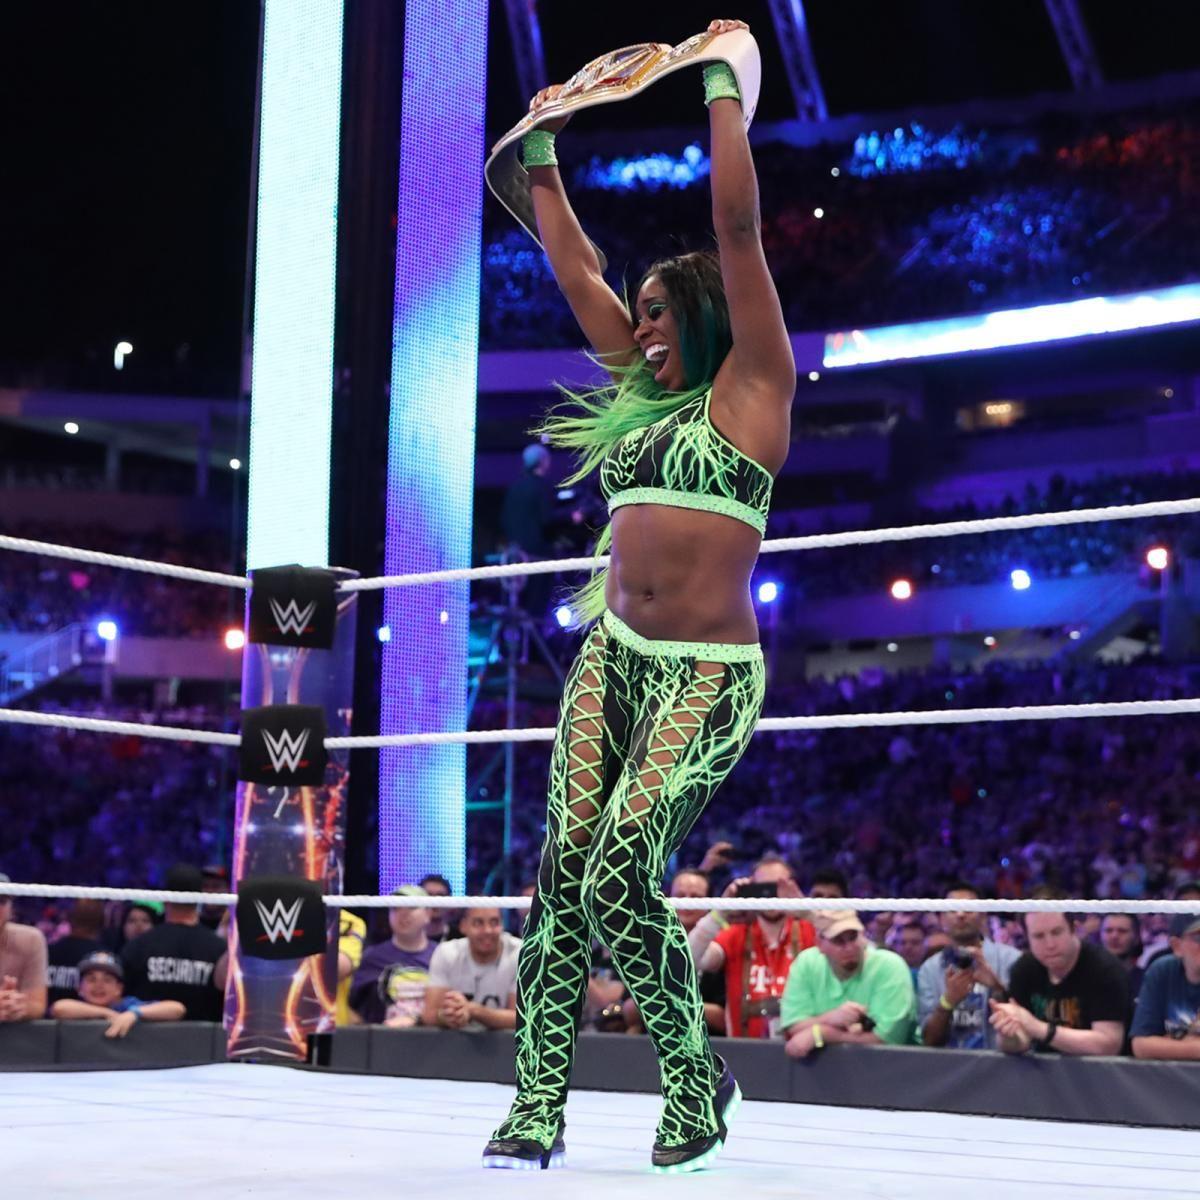 Naomi celebrates with the Smackdown Women's Championship at Wrestlemania 33